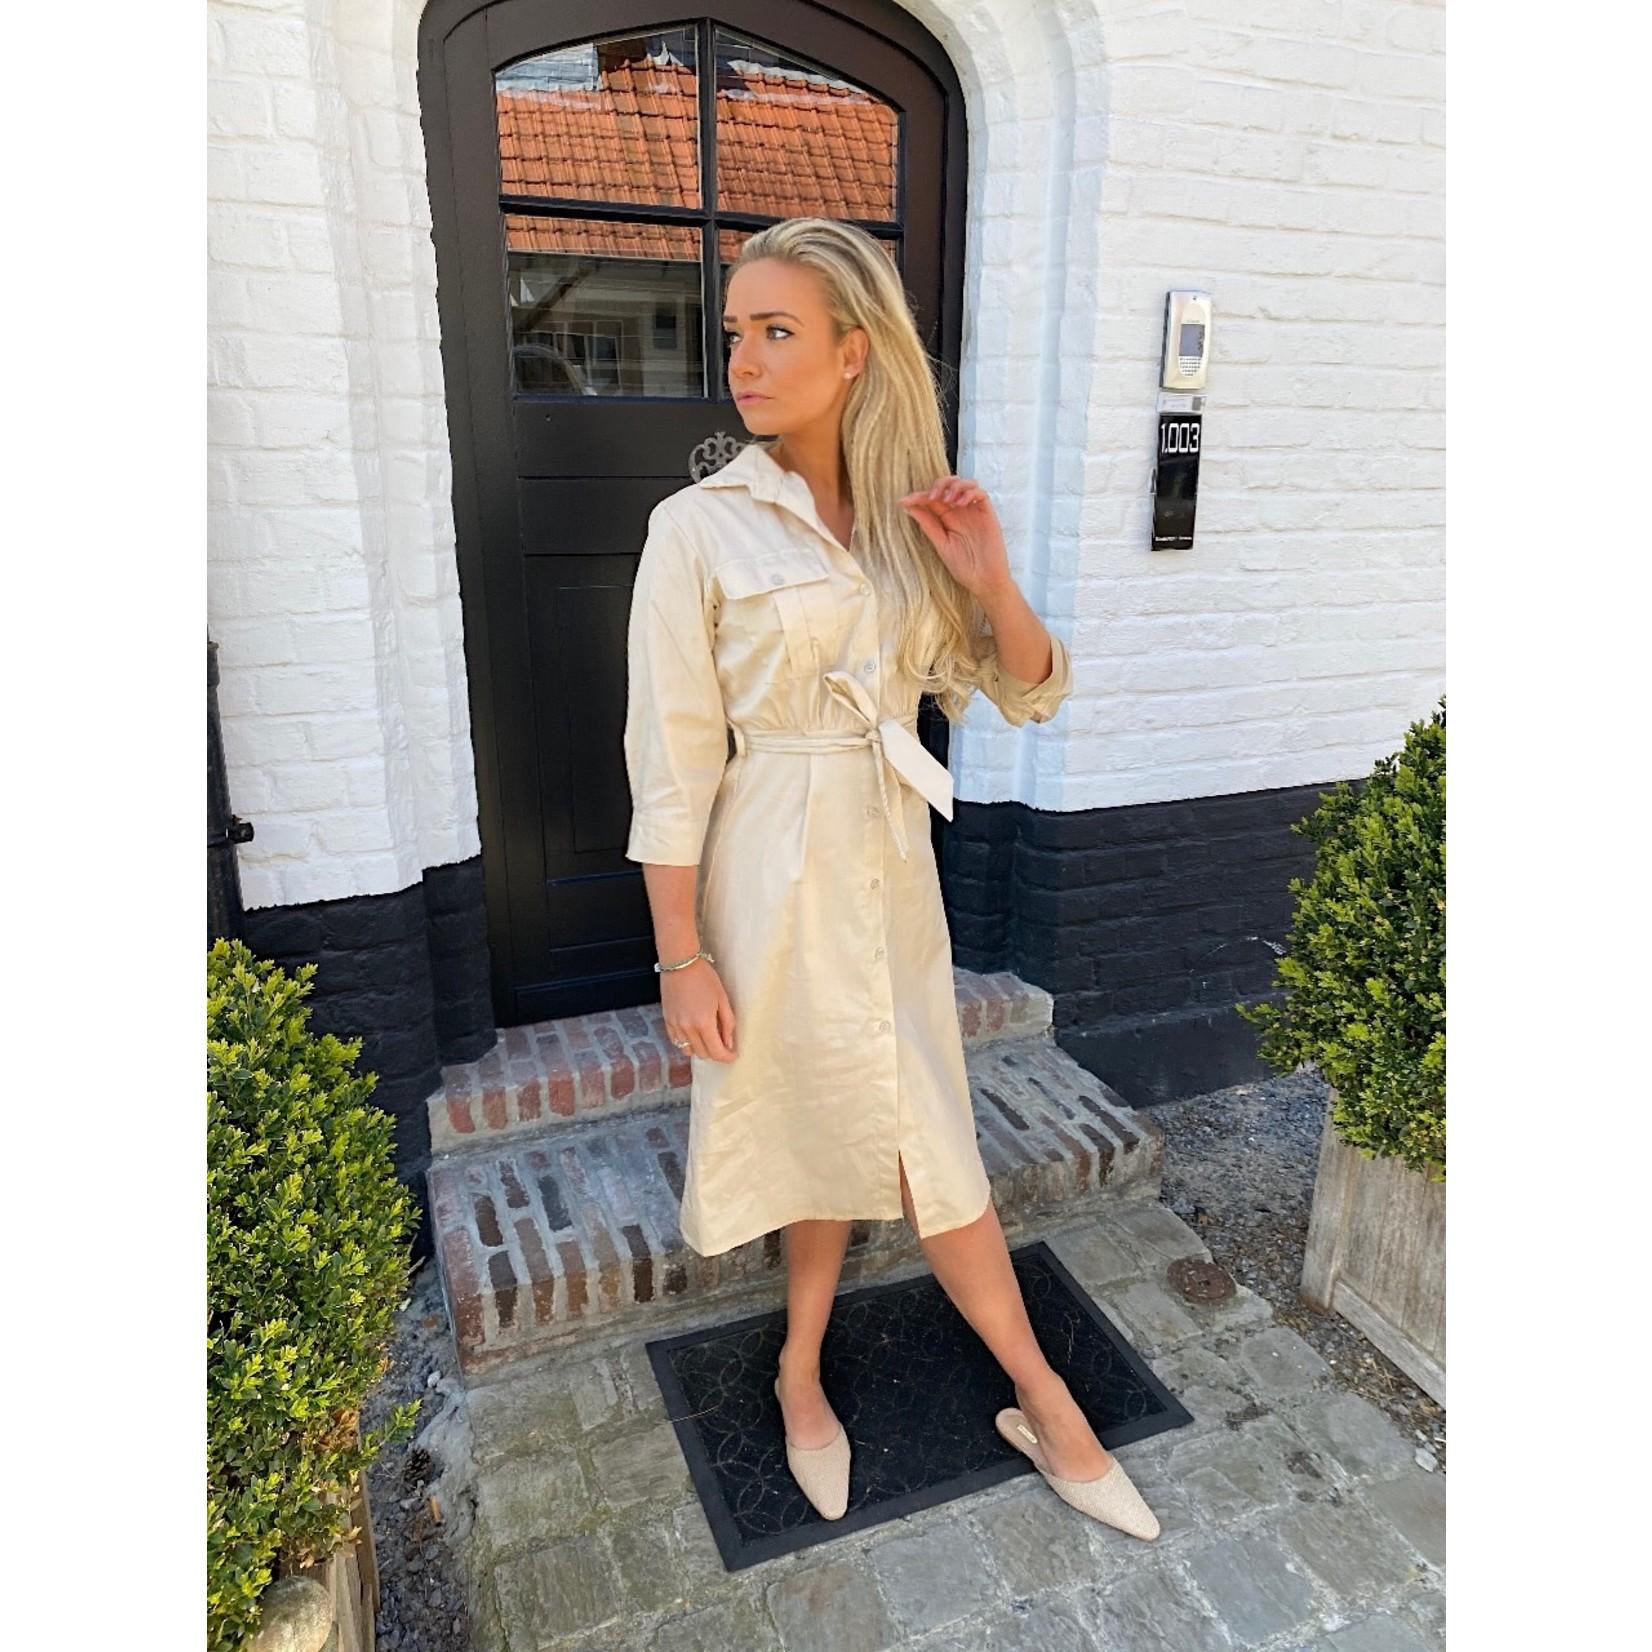 Dress - Victoria